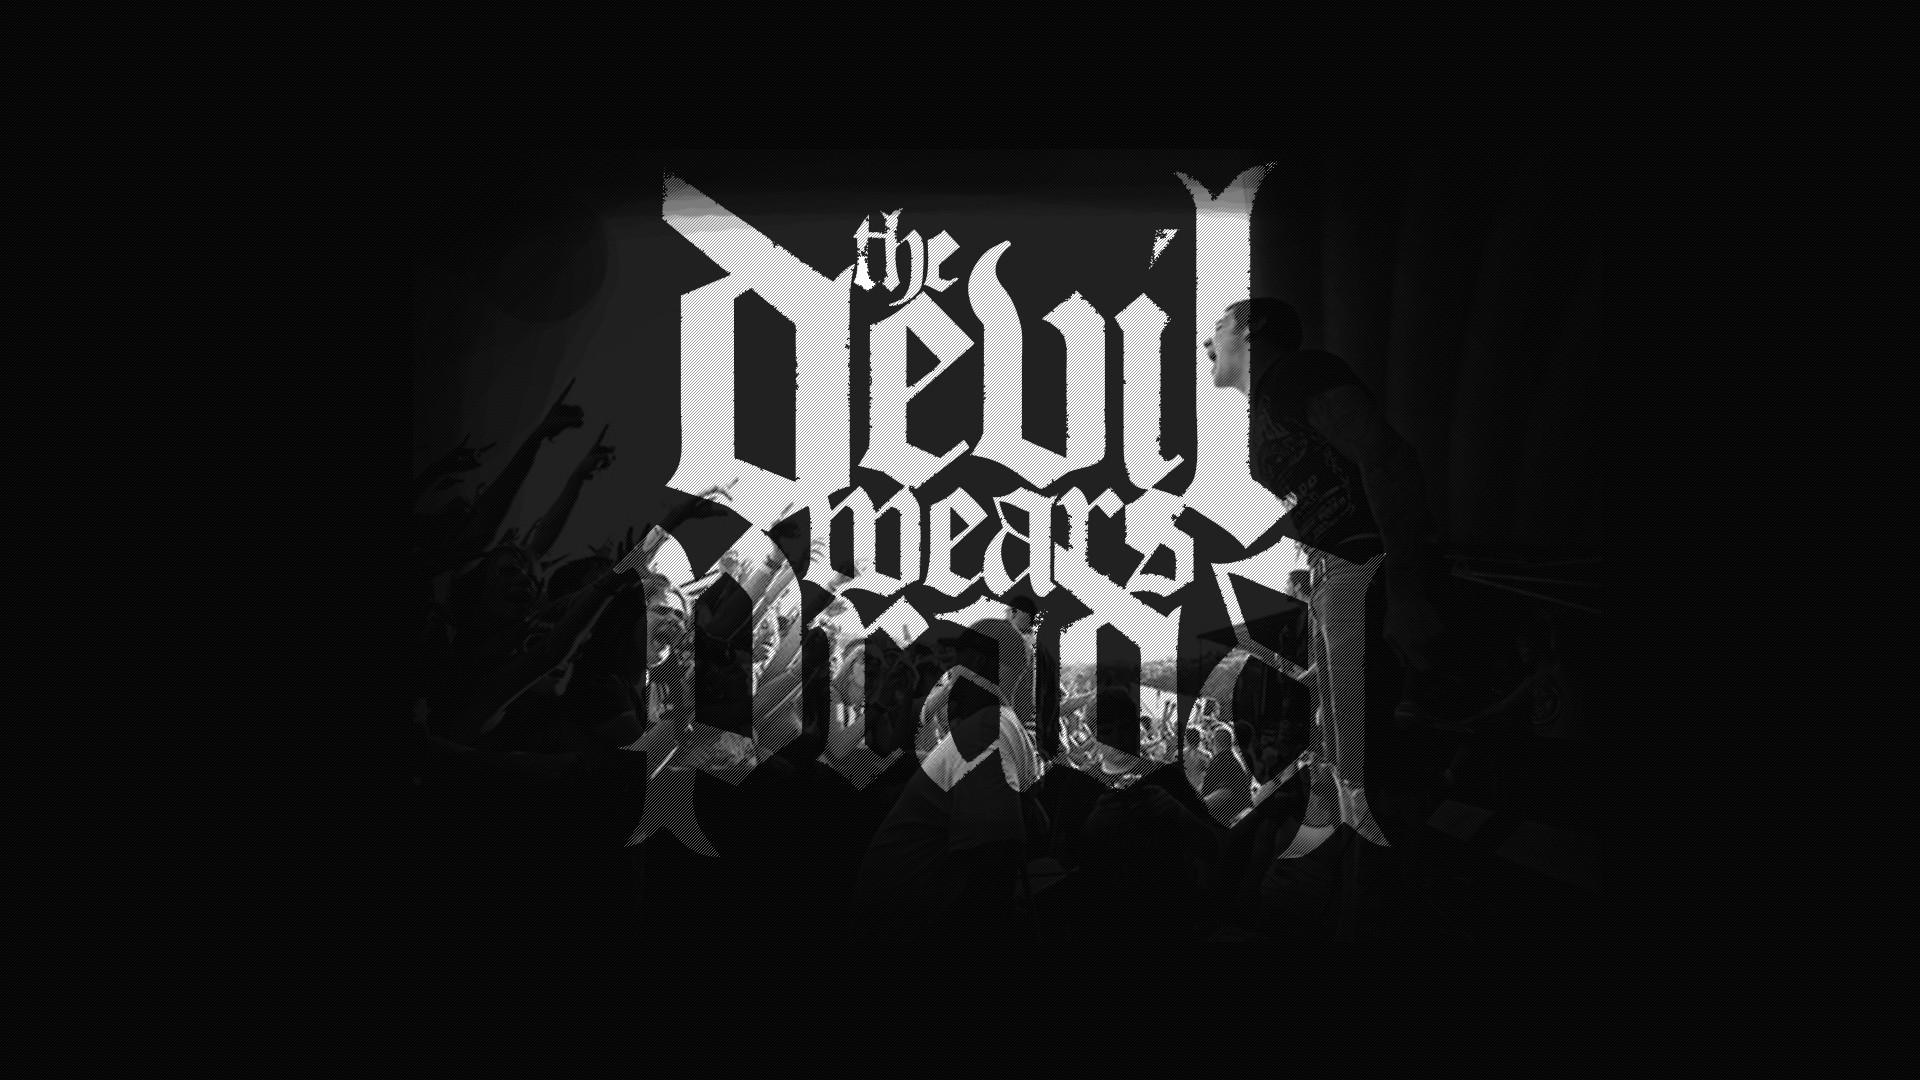 The Devil Wears Prada HD Wallpapers Backgrounds Wallpaper | HD Wallpapers |  Pinterest | Devil wears prada, Devil and Hd wallpaper